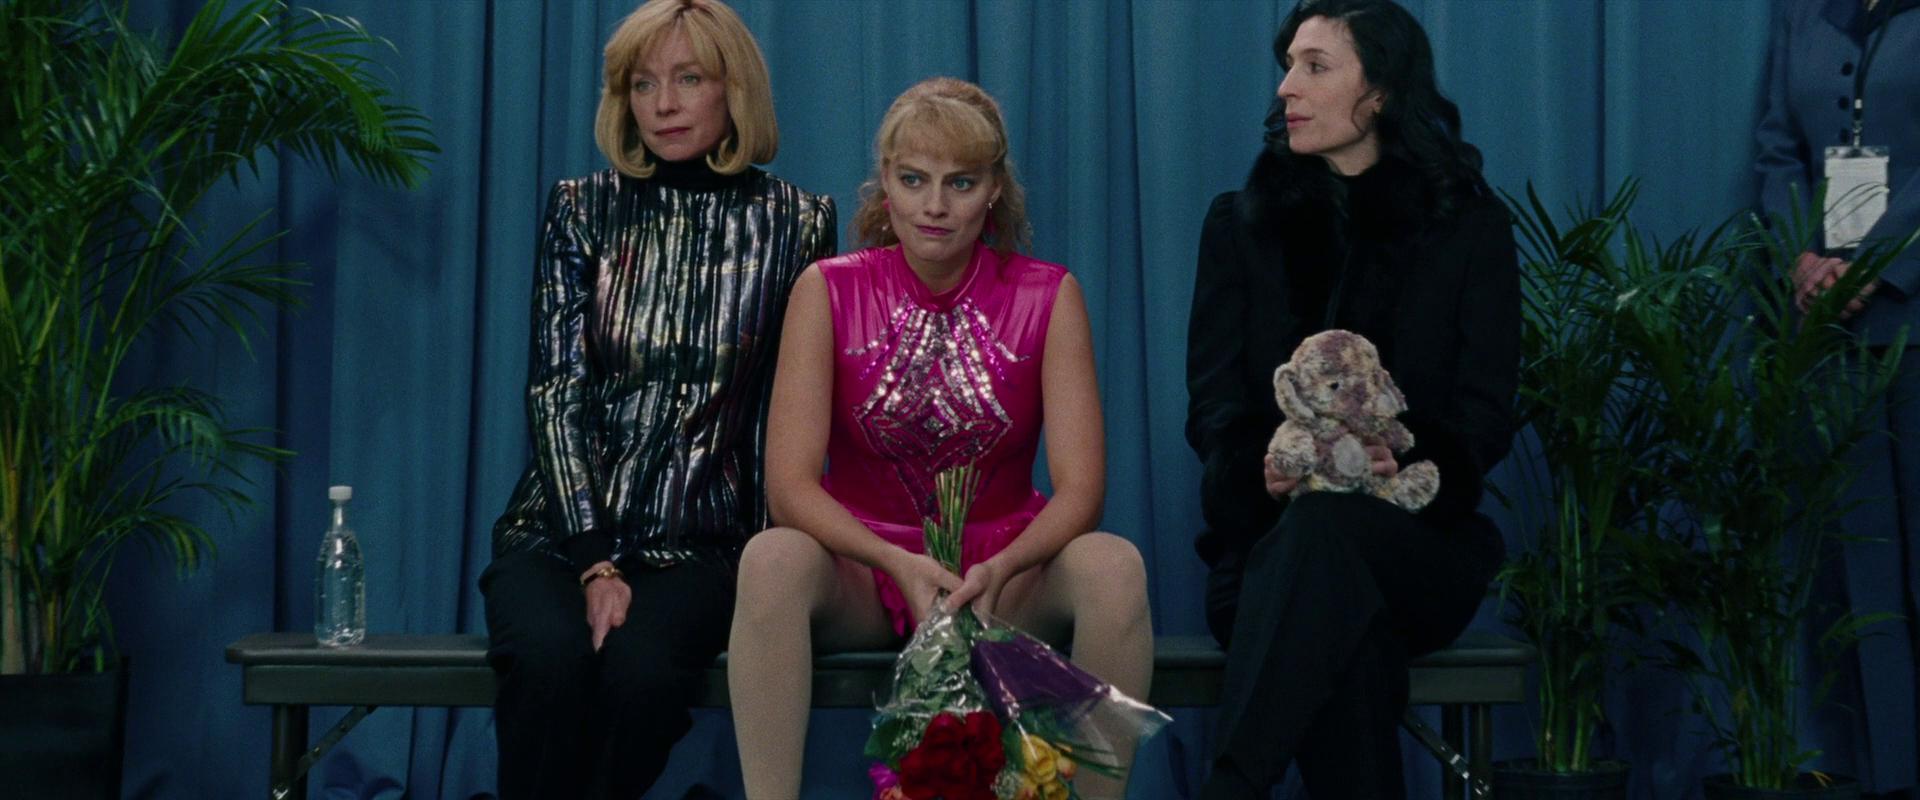 Julianne Nicholson, Cara Mantella, and Margot Robbie in I, Tonya (2017)